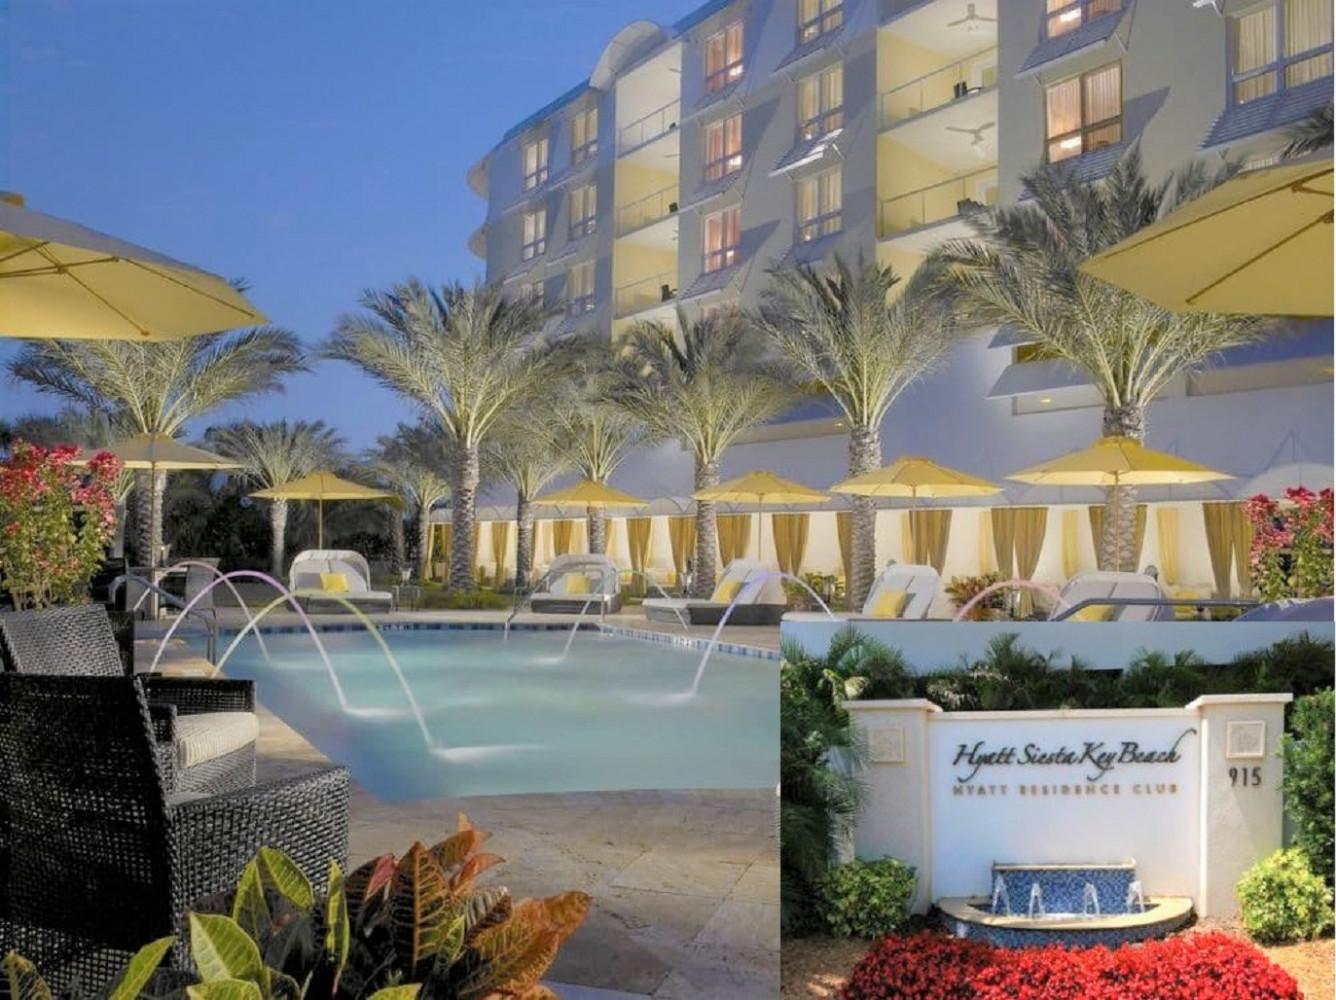 3 Bed/3 Bath Luxury Penthouse - Siesta Key Vacation Rentals